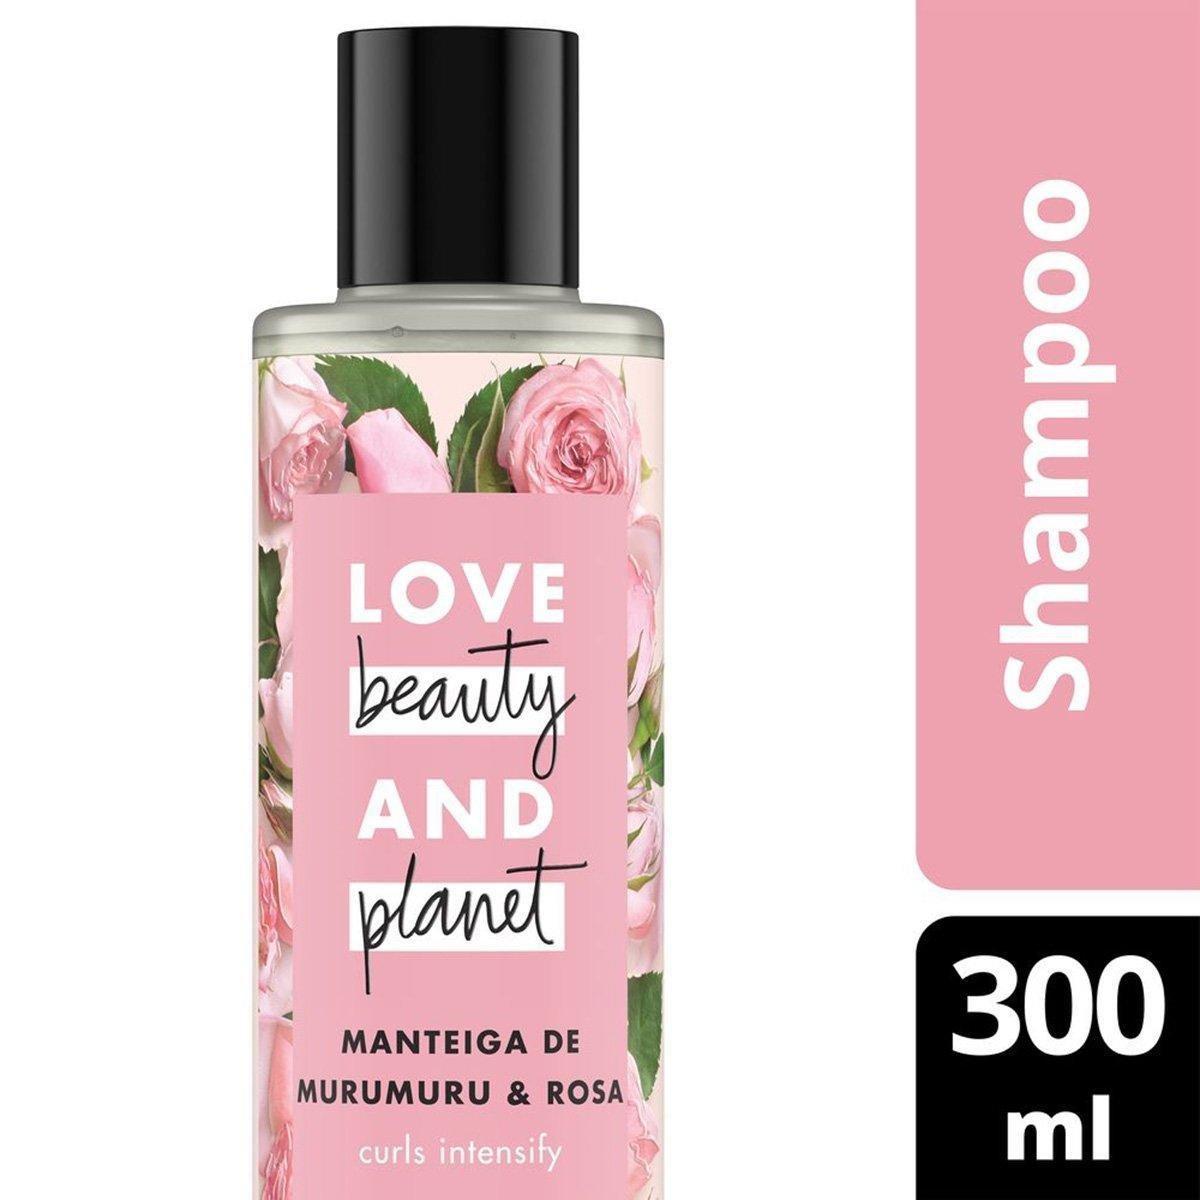 Shampoo Curls Intensify Manteiga de Murumuru & Rosa Love Beauty and Planet 300ml